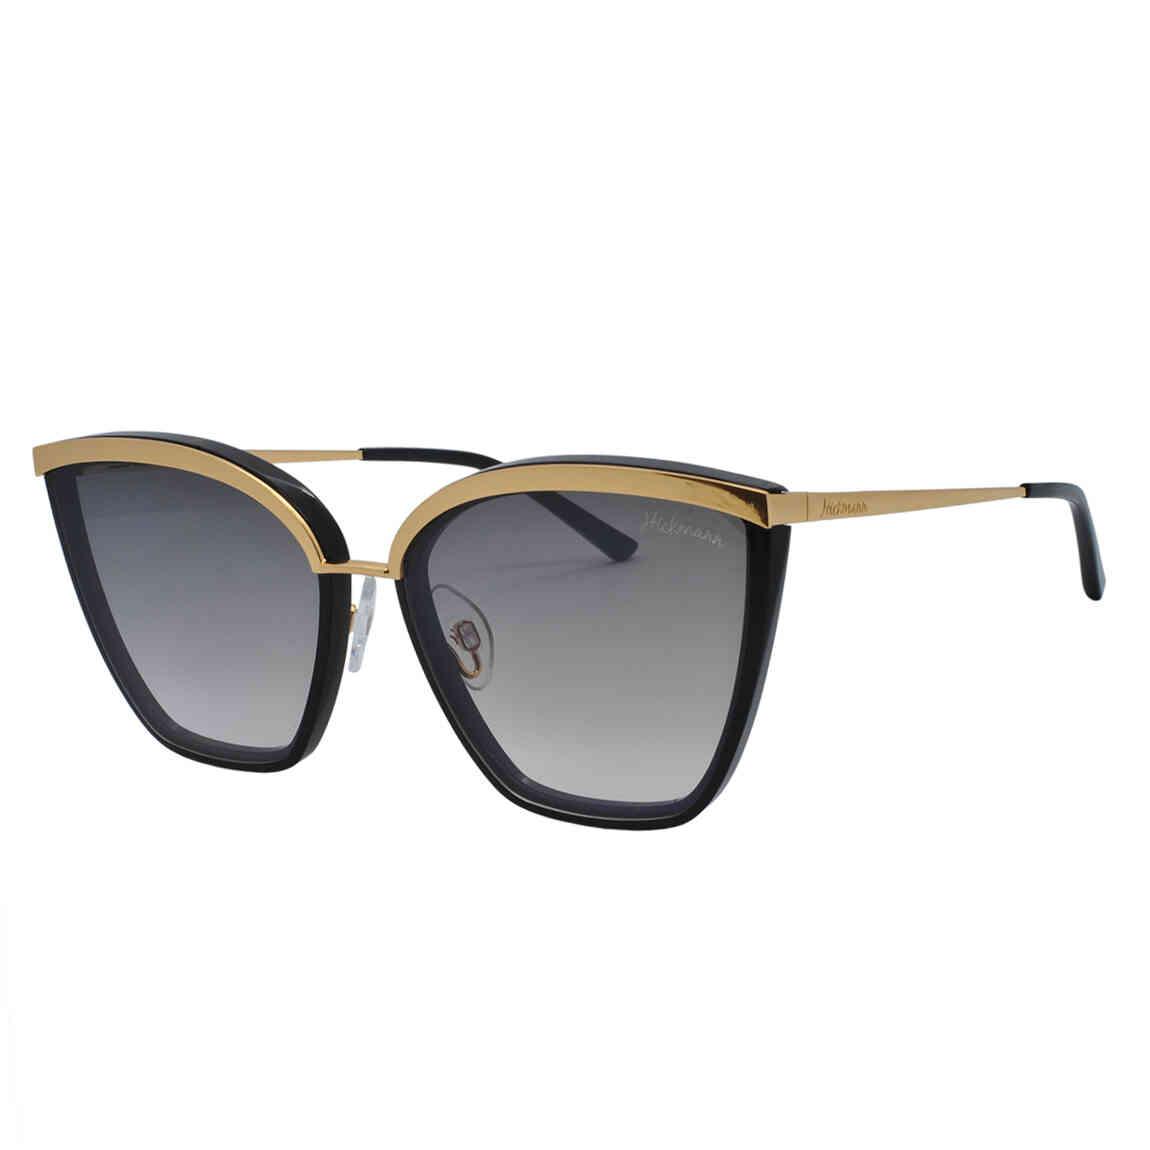 Óculos de Sol Hickmann Evolve Feminino HI9077